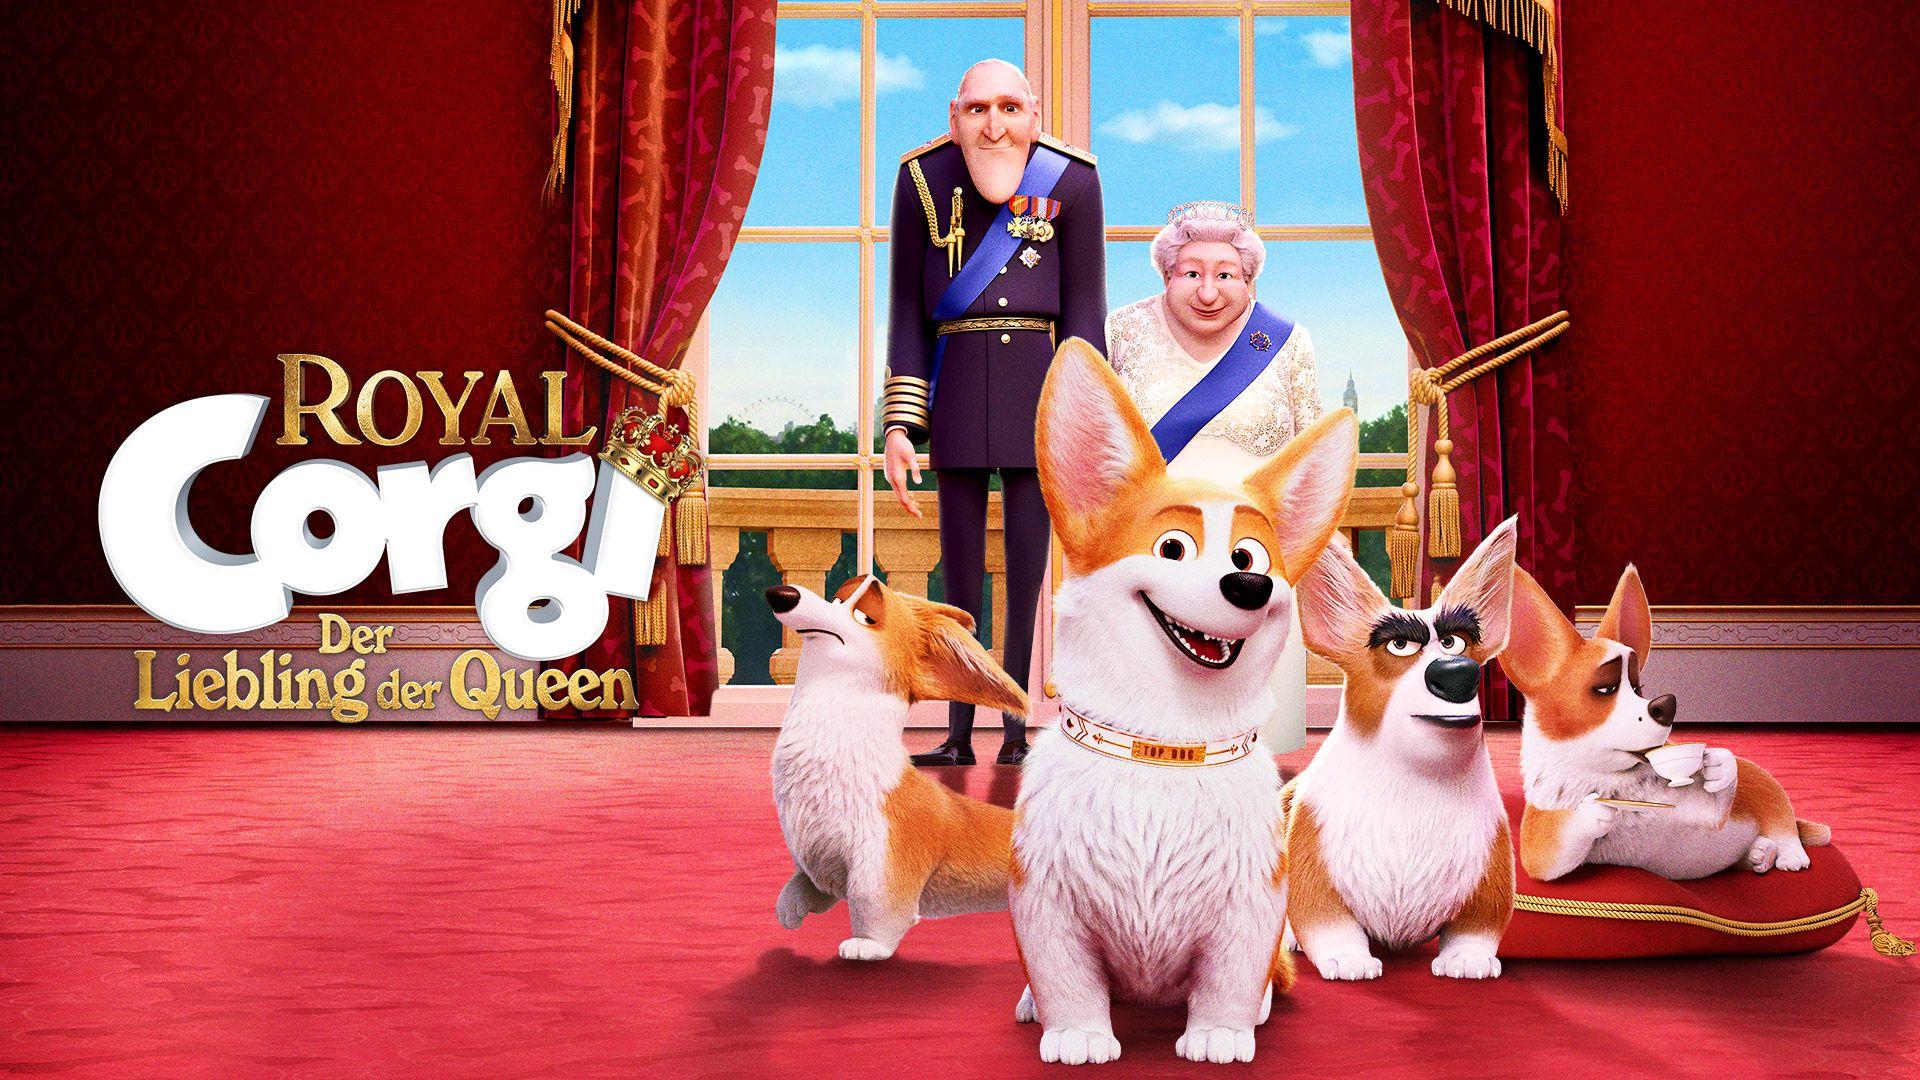 Royal Corgi - Der Liebling der Queen [dt./OV]